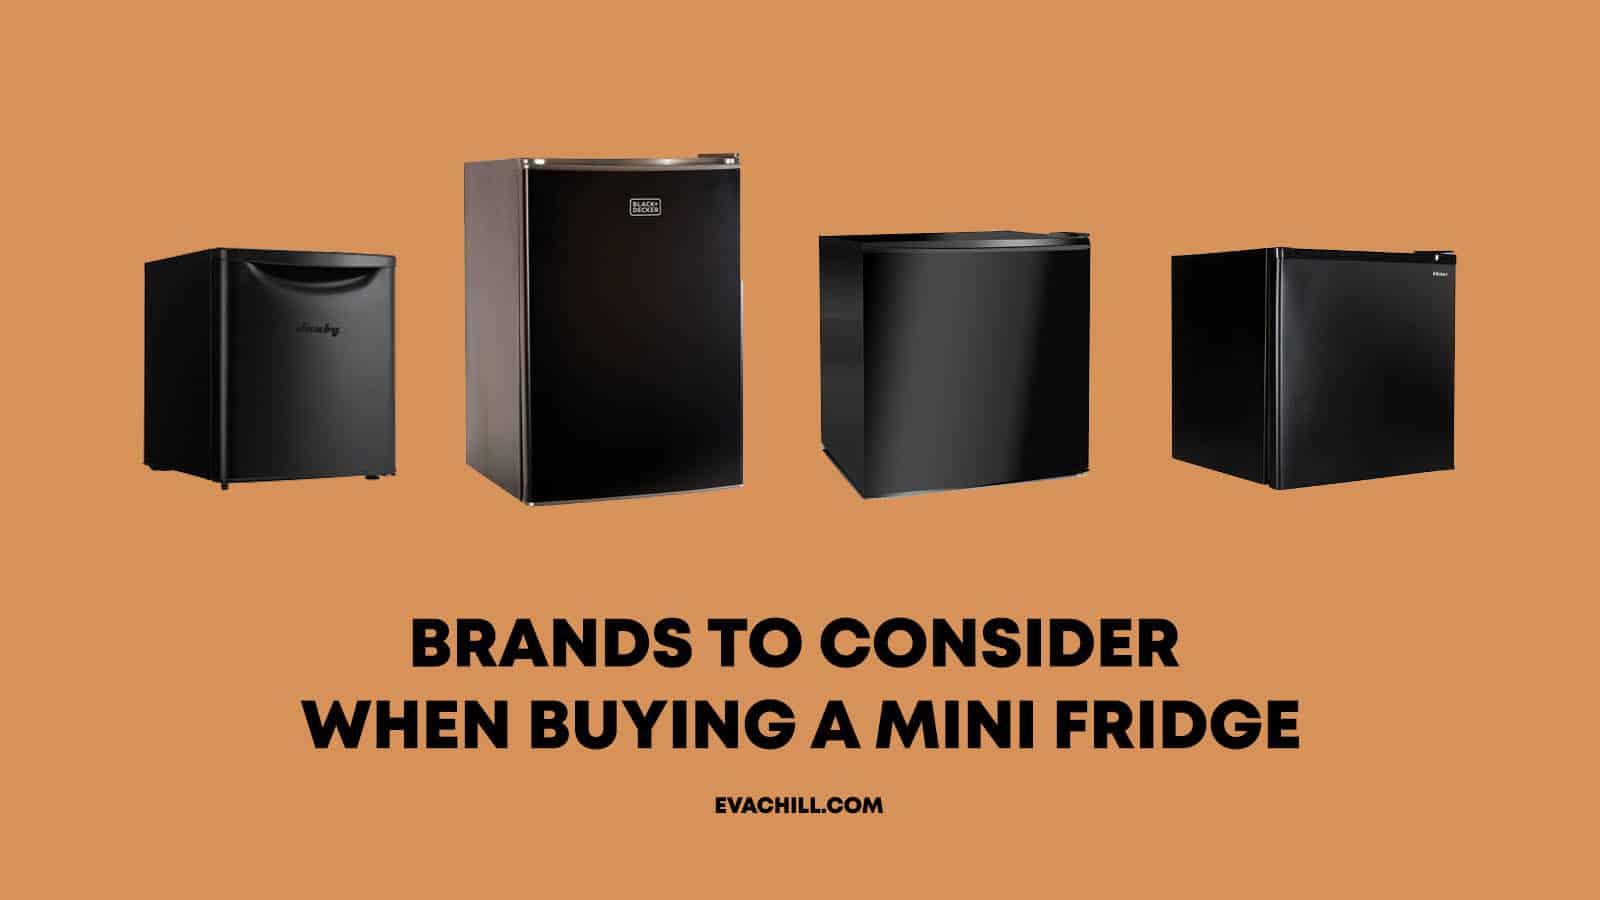 Best Mini Fridge Brands